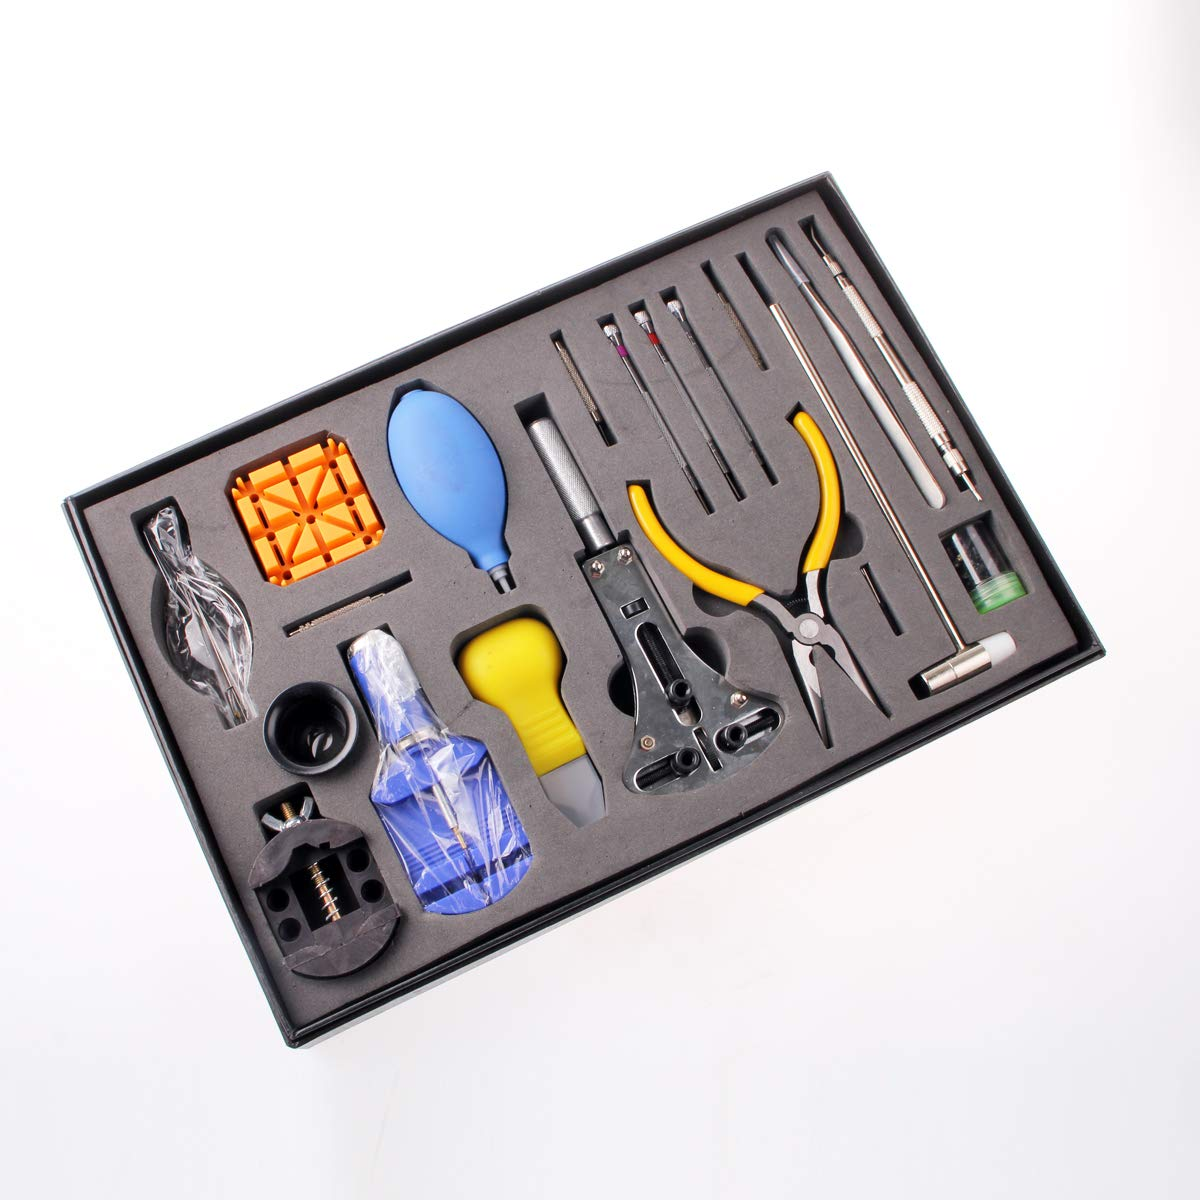 Amazon.com: Kit profesional de reparación de relojes ...